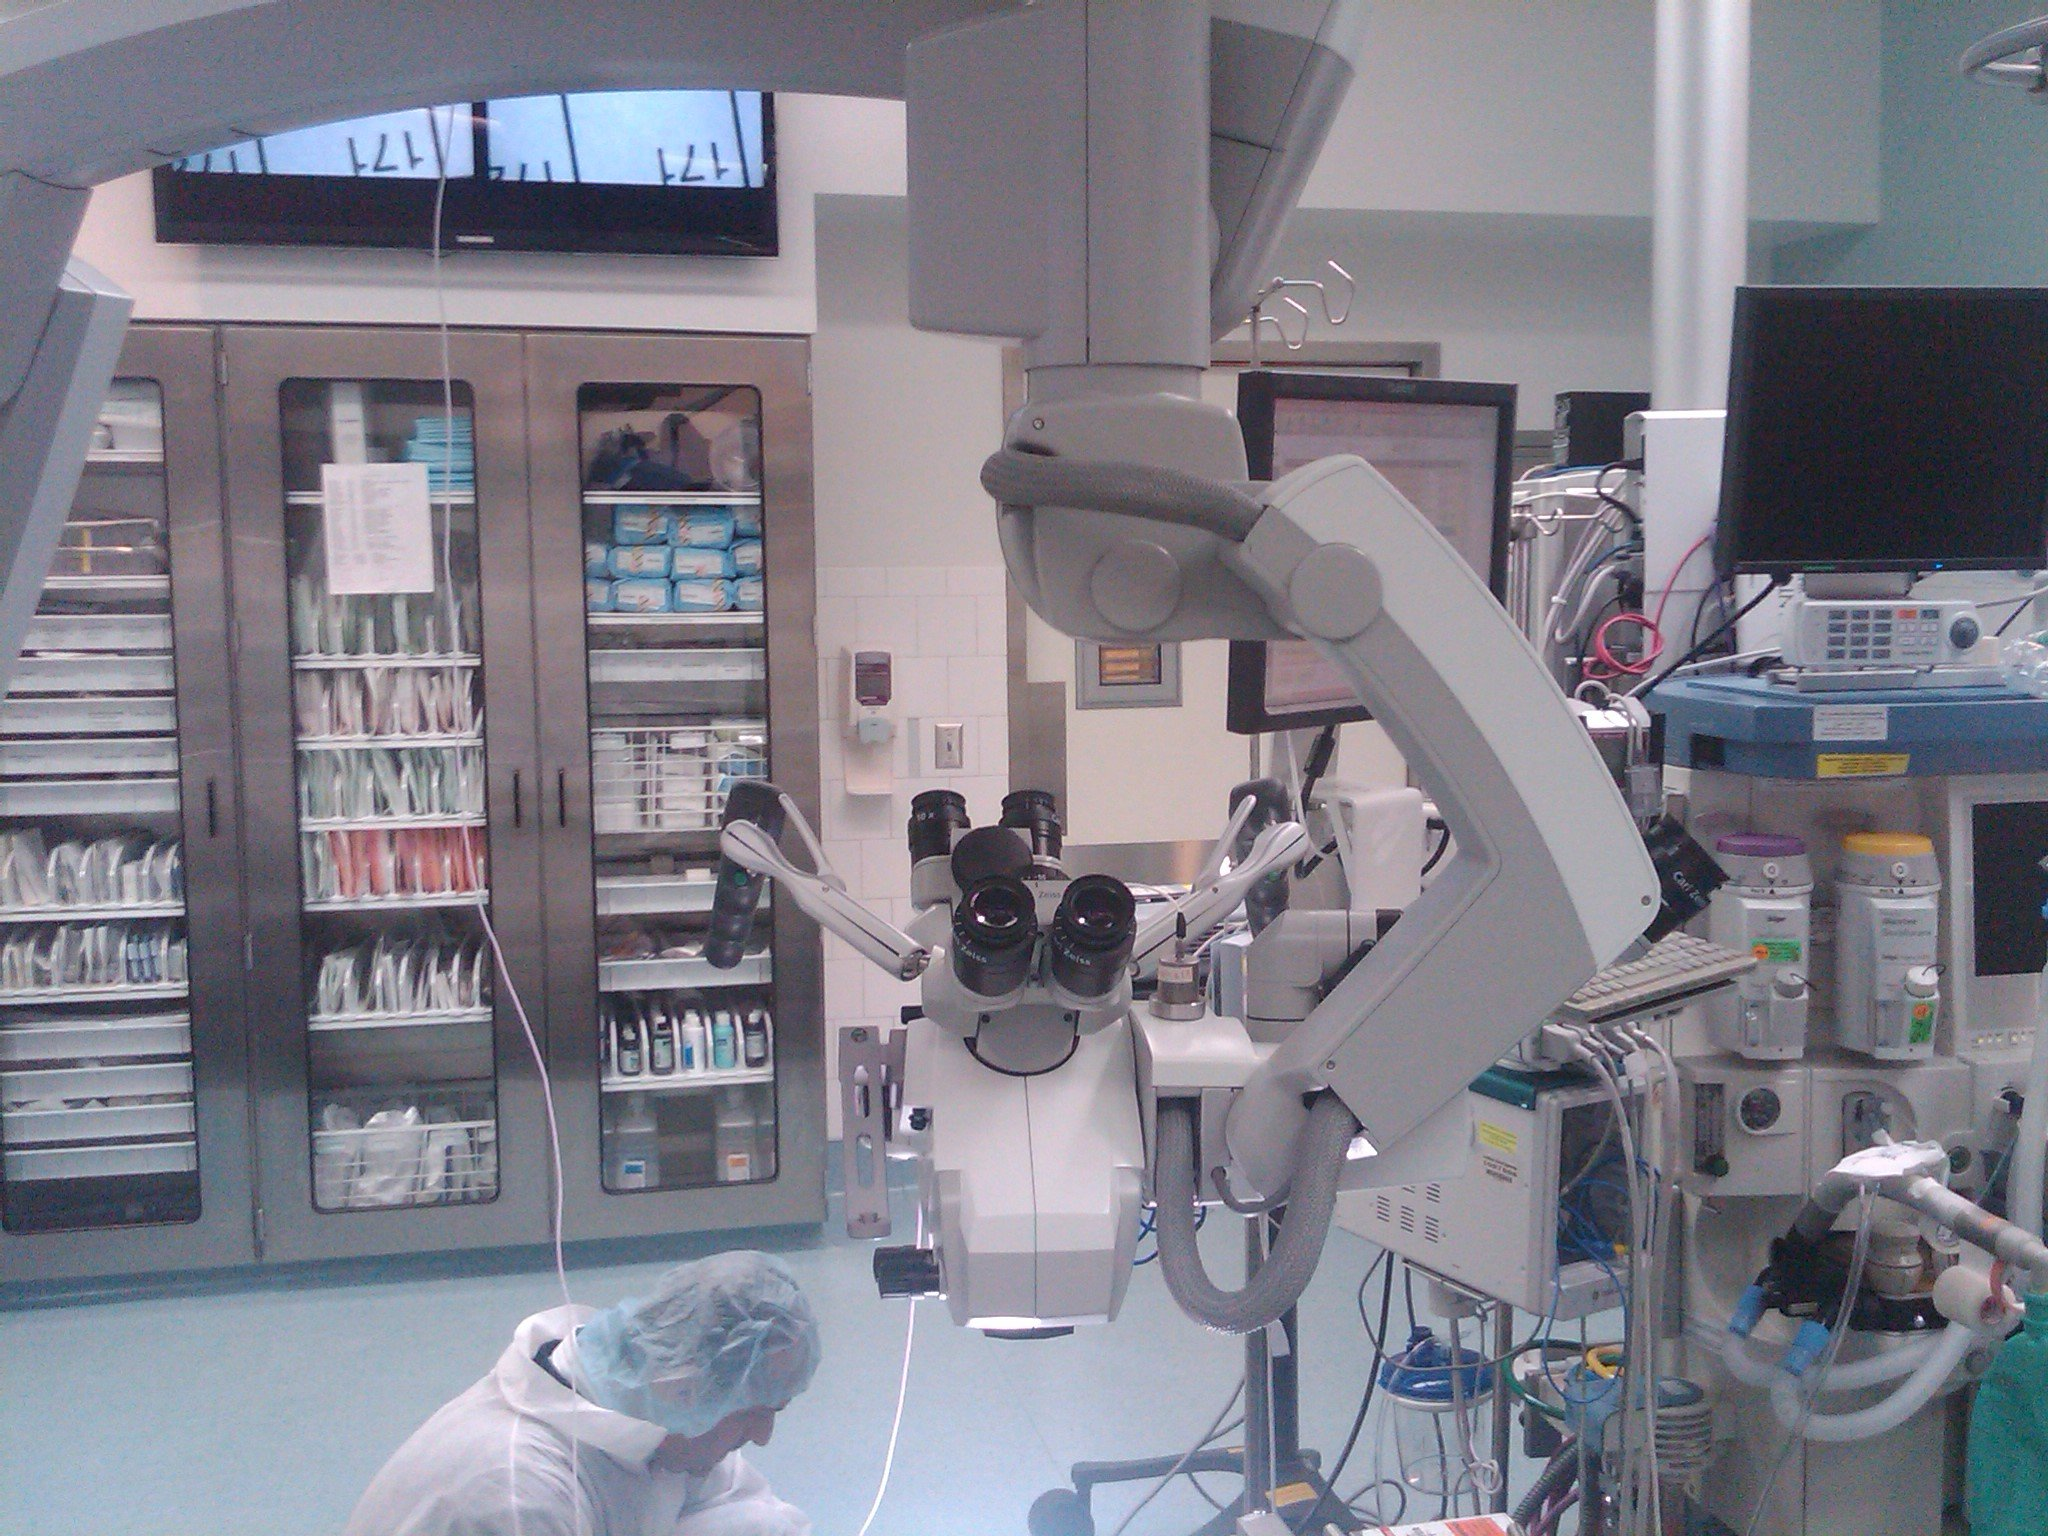 Instrumented-Microscope-1.jpg